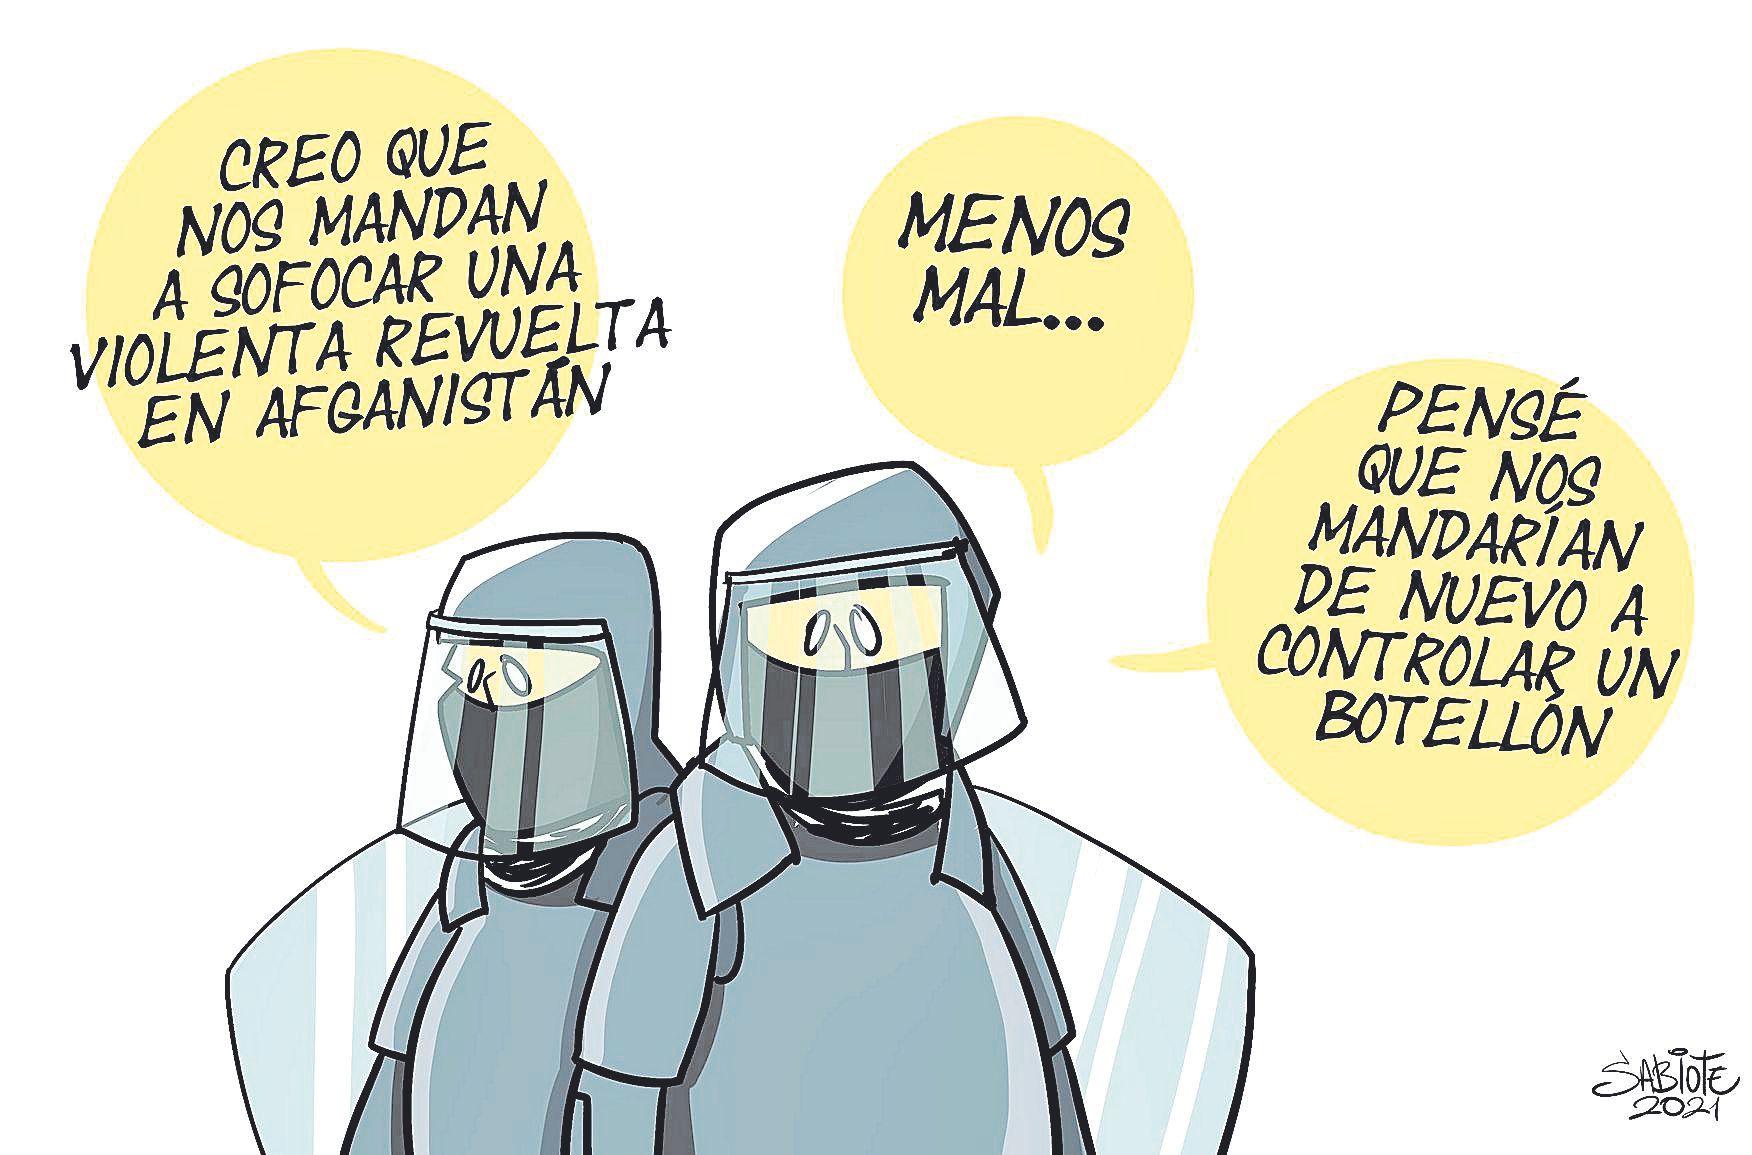 La Rendija de Sabiote (13/10/2021)